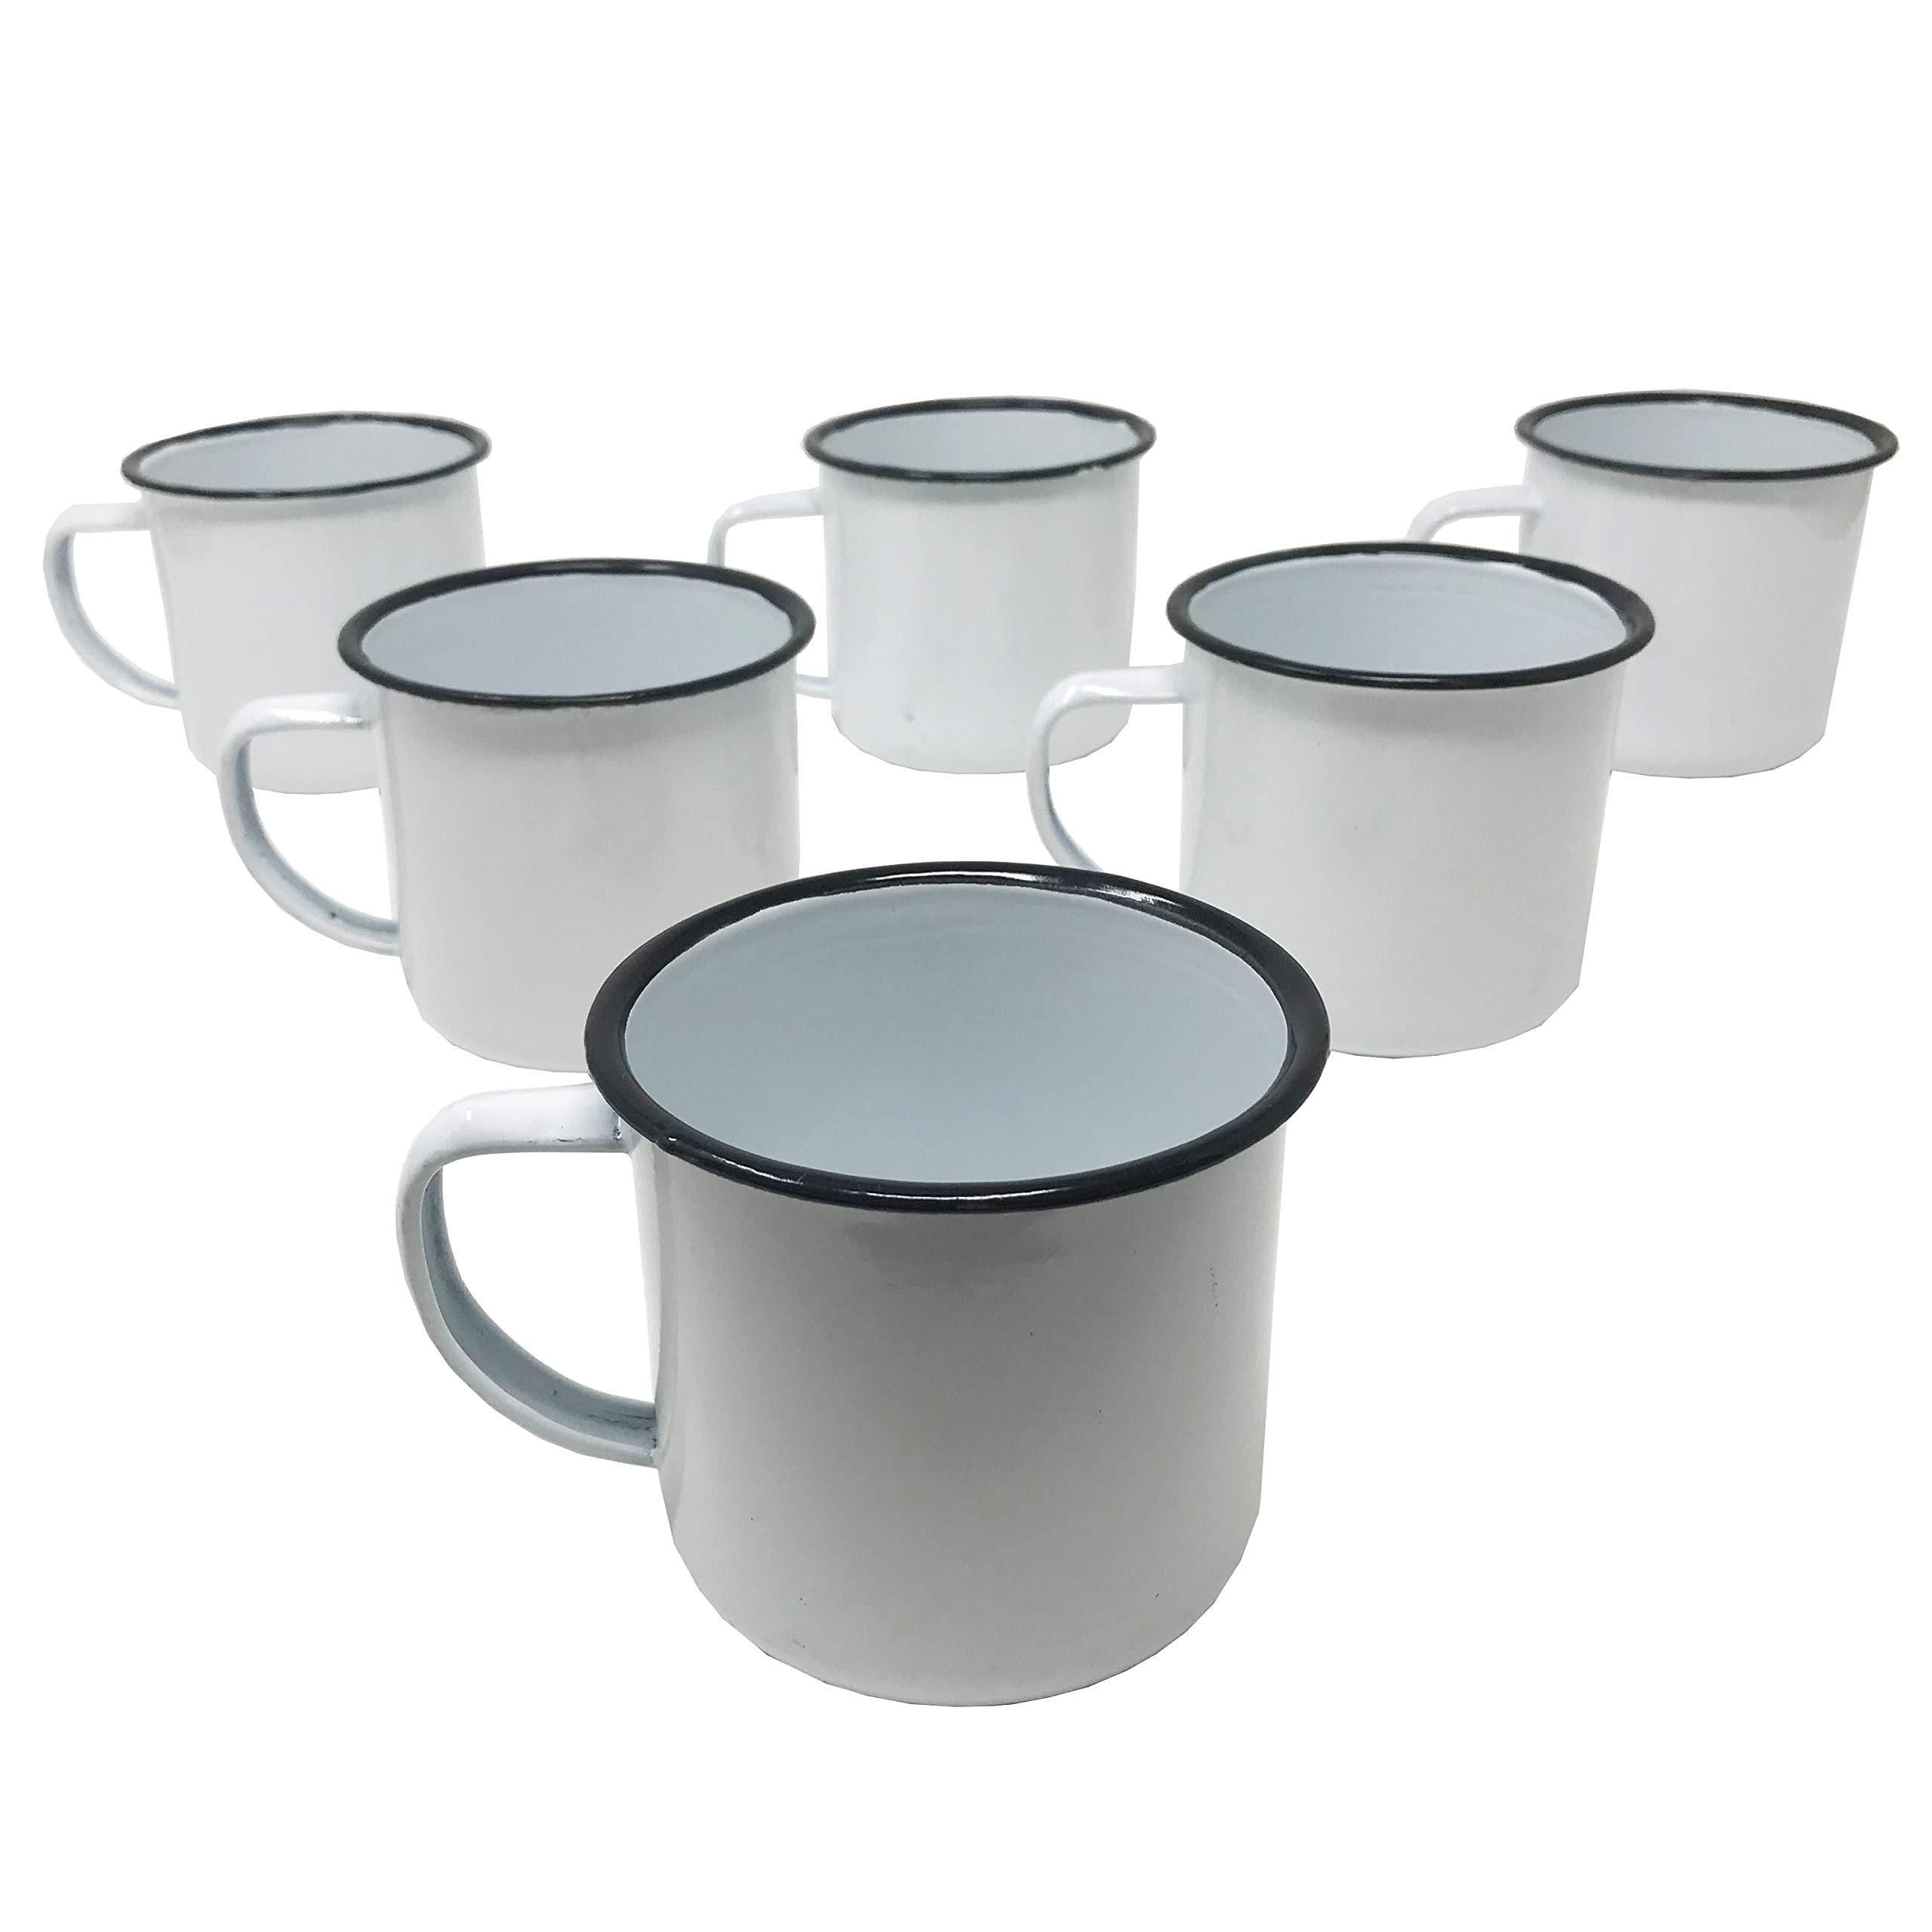 PeltreMxMx Enamel Camping Mug Hardware Metal Cups Steel Metallic Adventure Travel Accesories Coffee Mugs to Go by PeltreMxMx